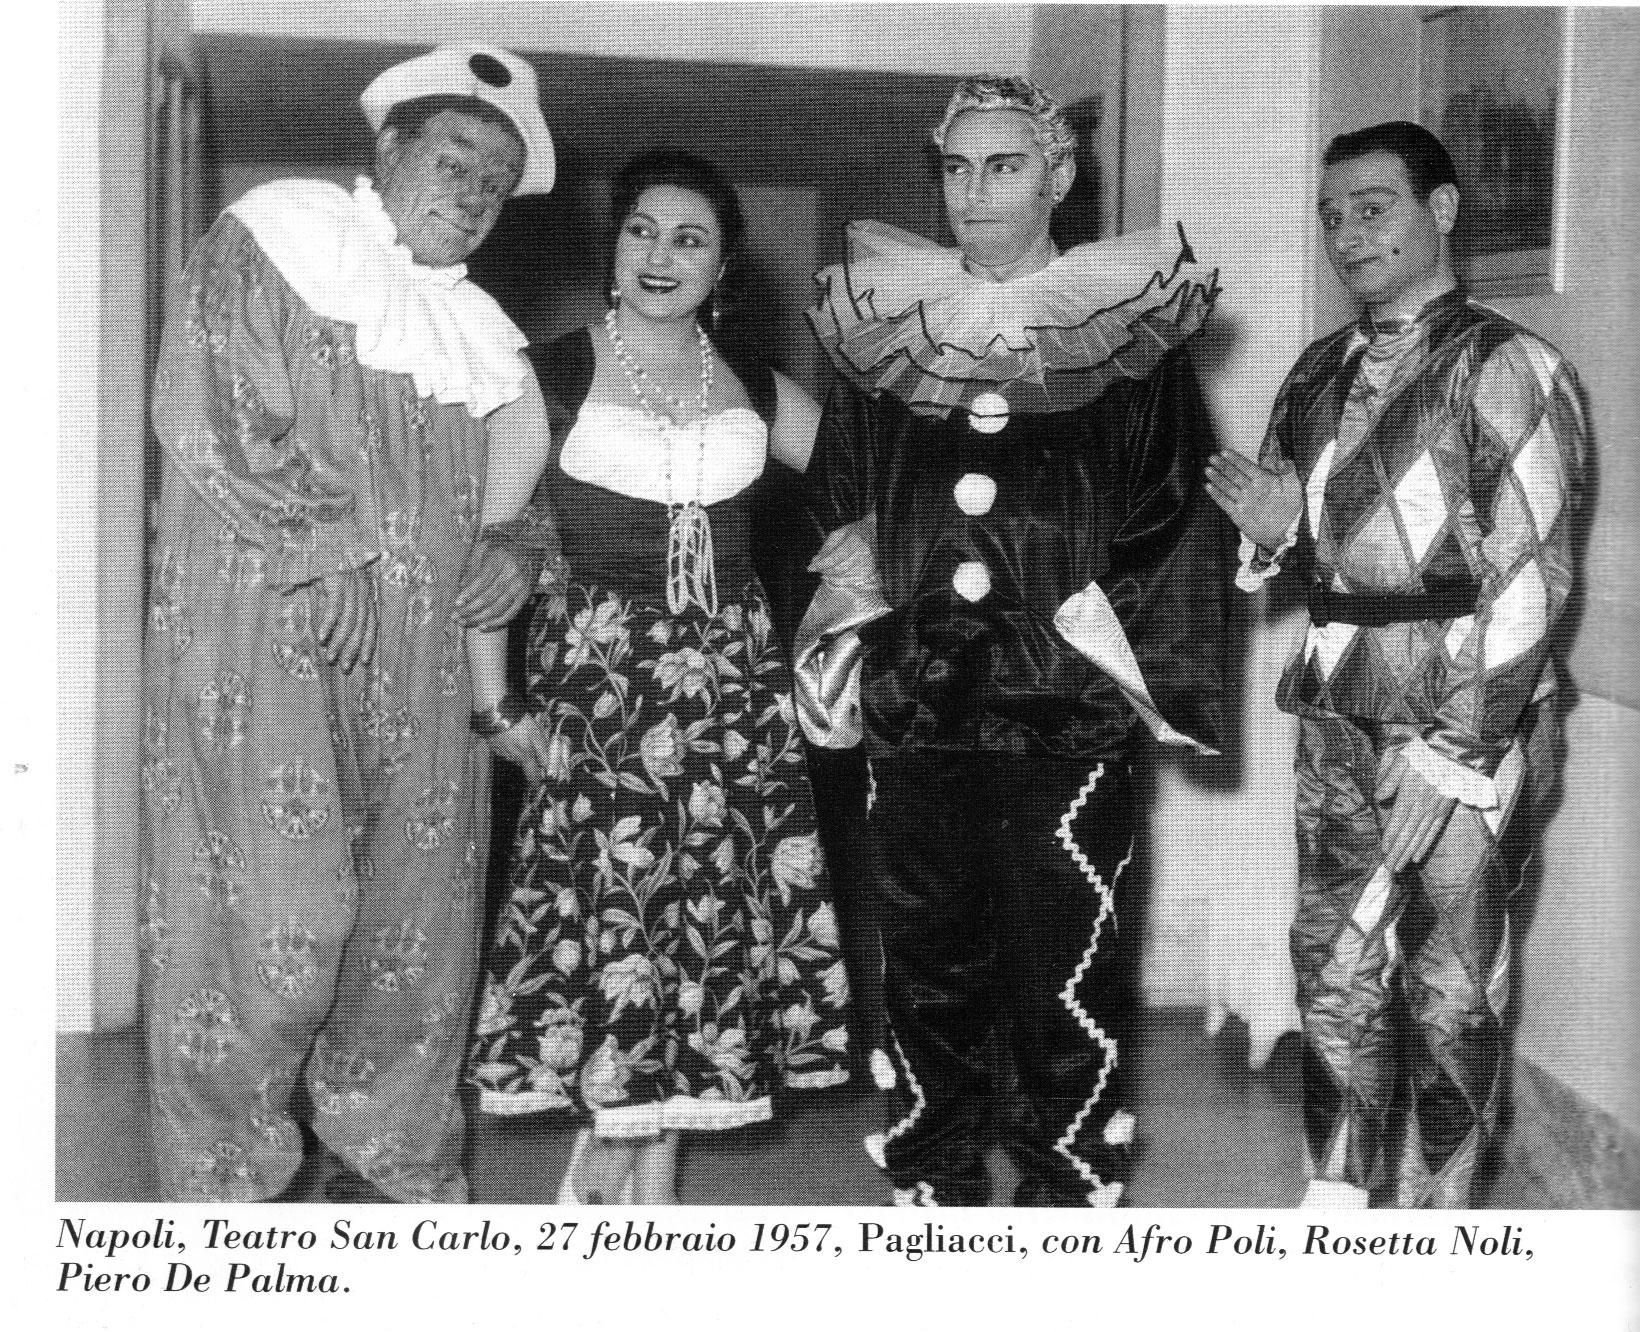 a dx Piero De Palma (Arlecchino) accanto a Mario Del Monaco, Rosetta Noli e Afro Poli